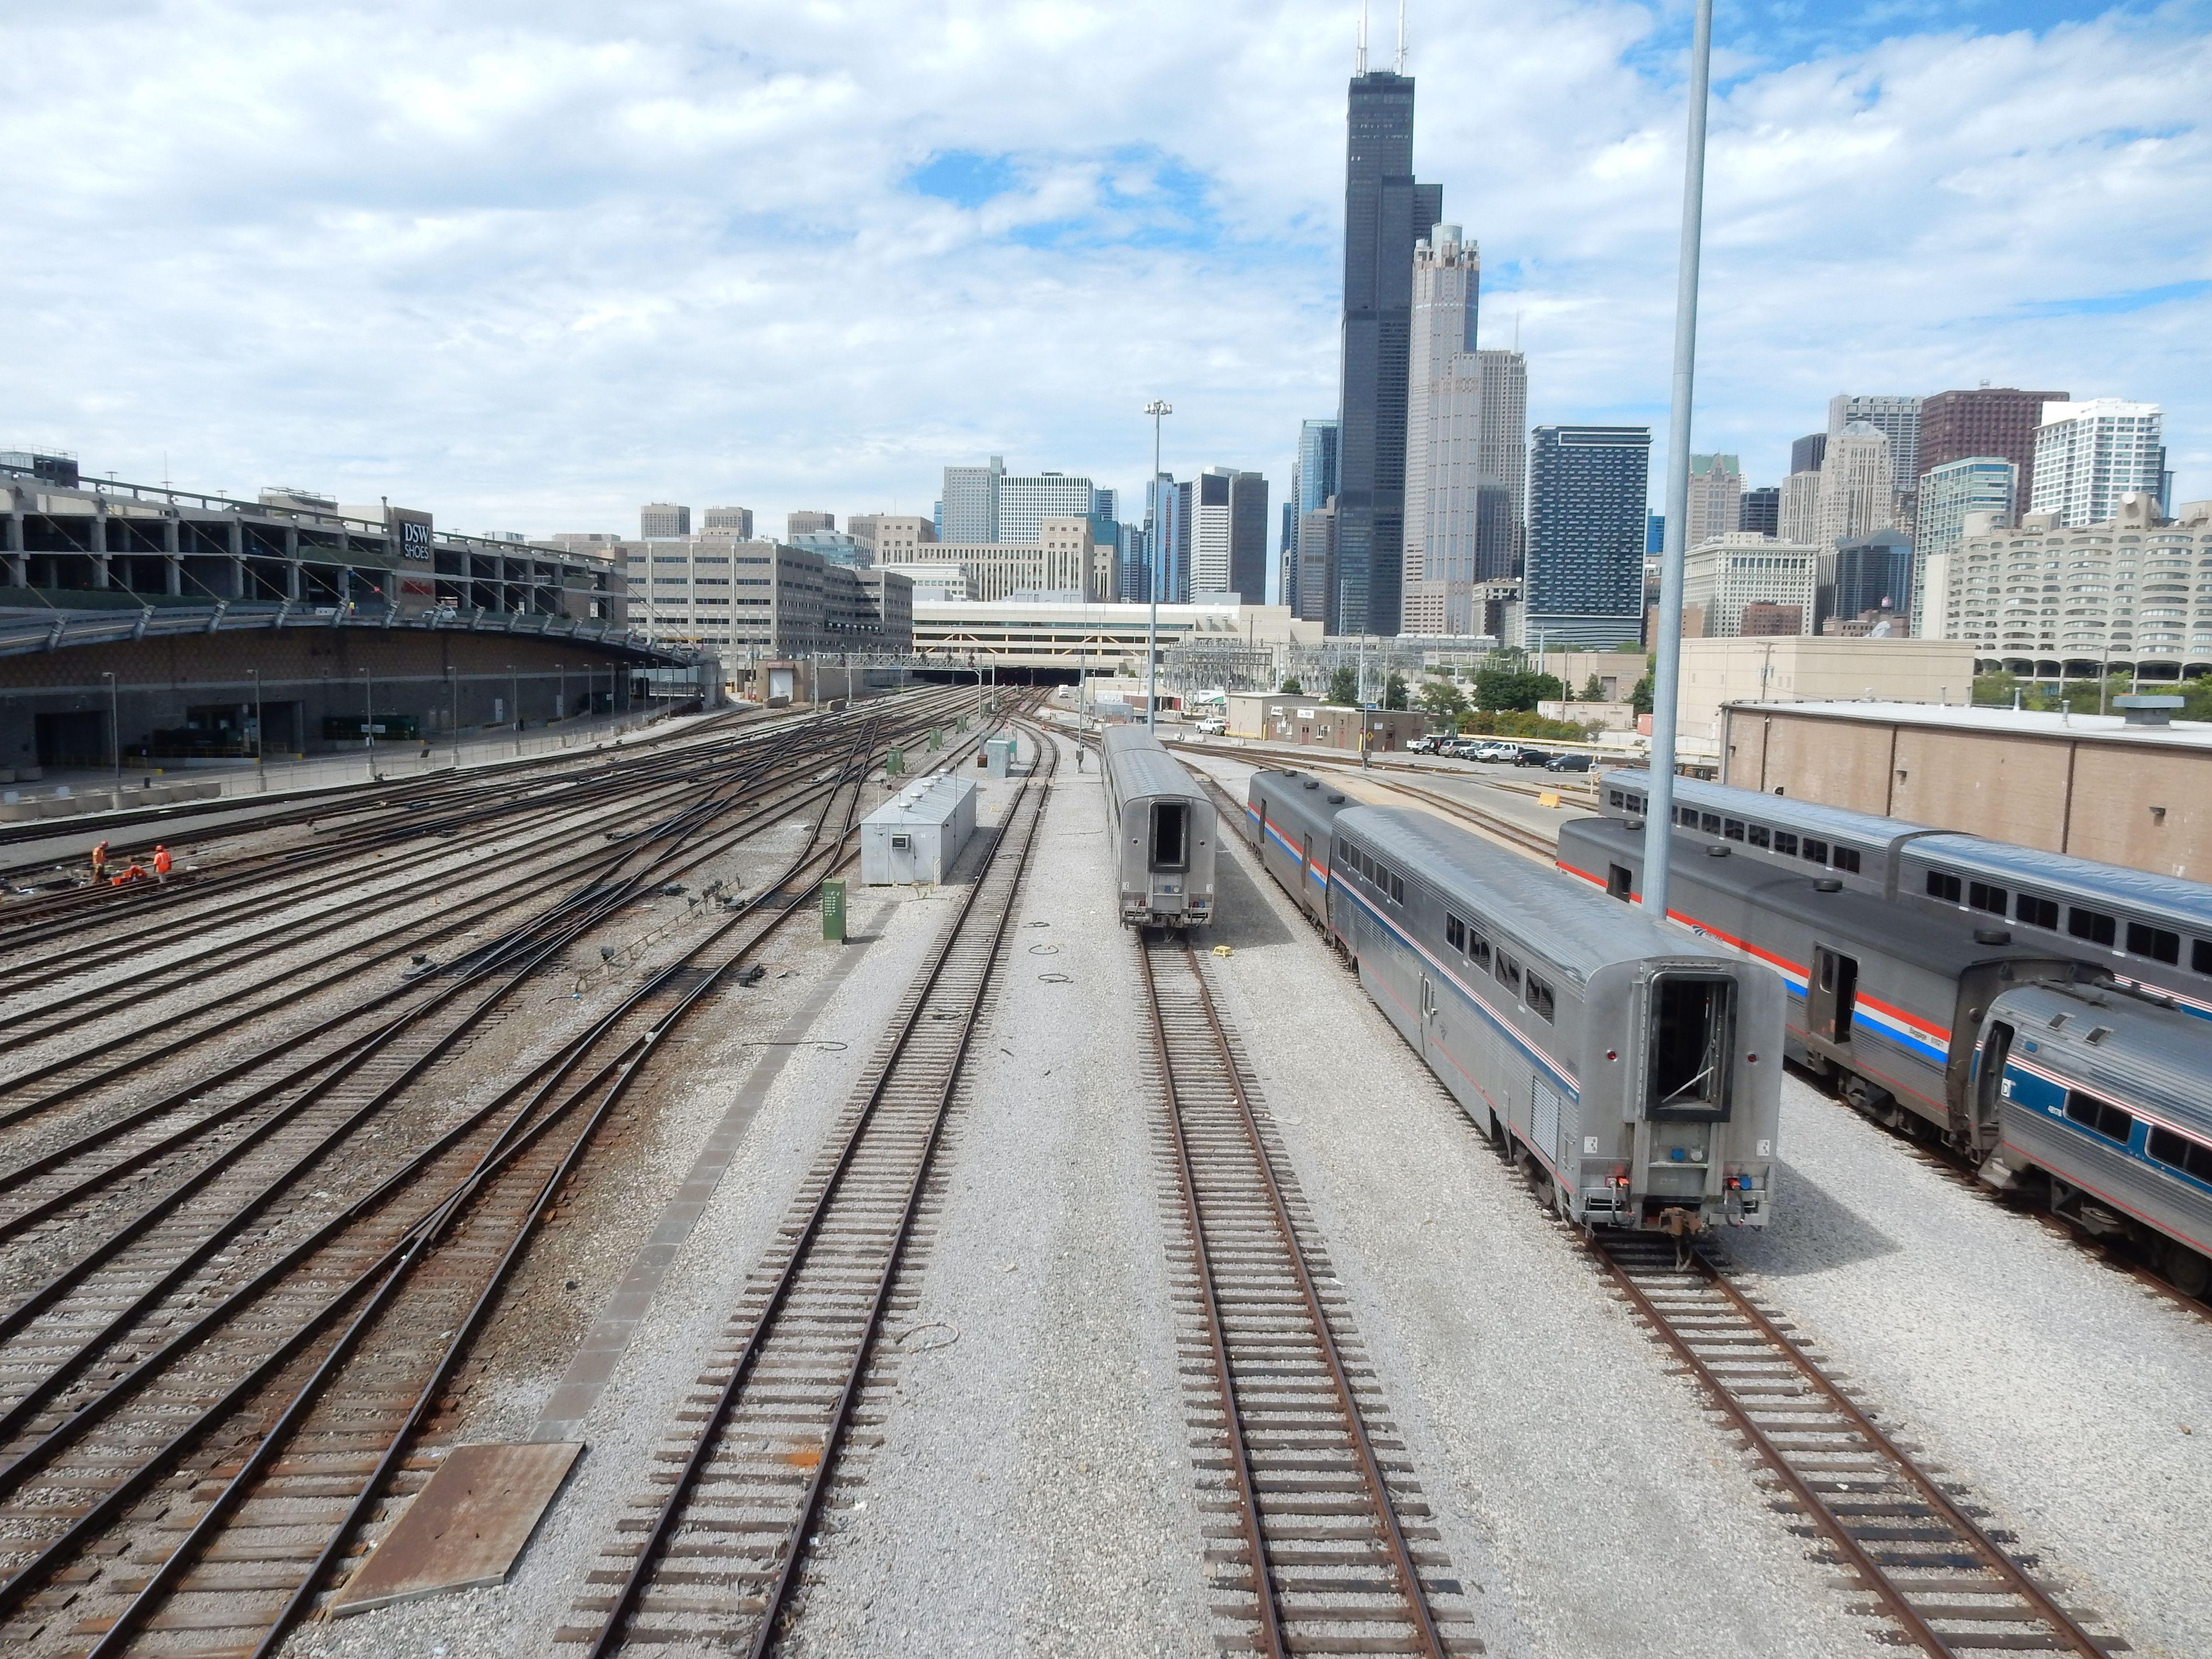 Amtrak Train Yard At Chicago Amtrak Train Amtrak Railroad Tracks